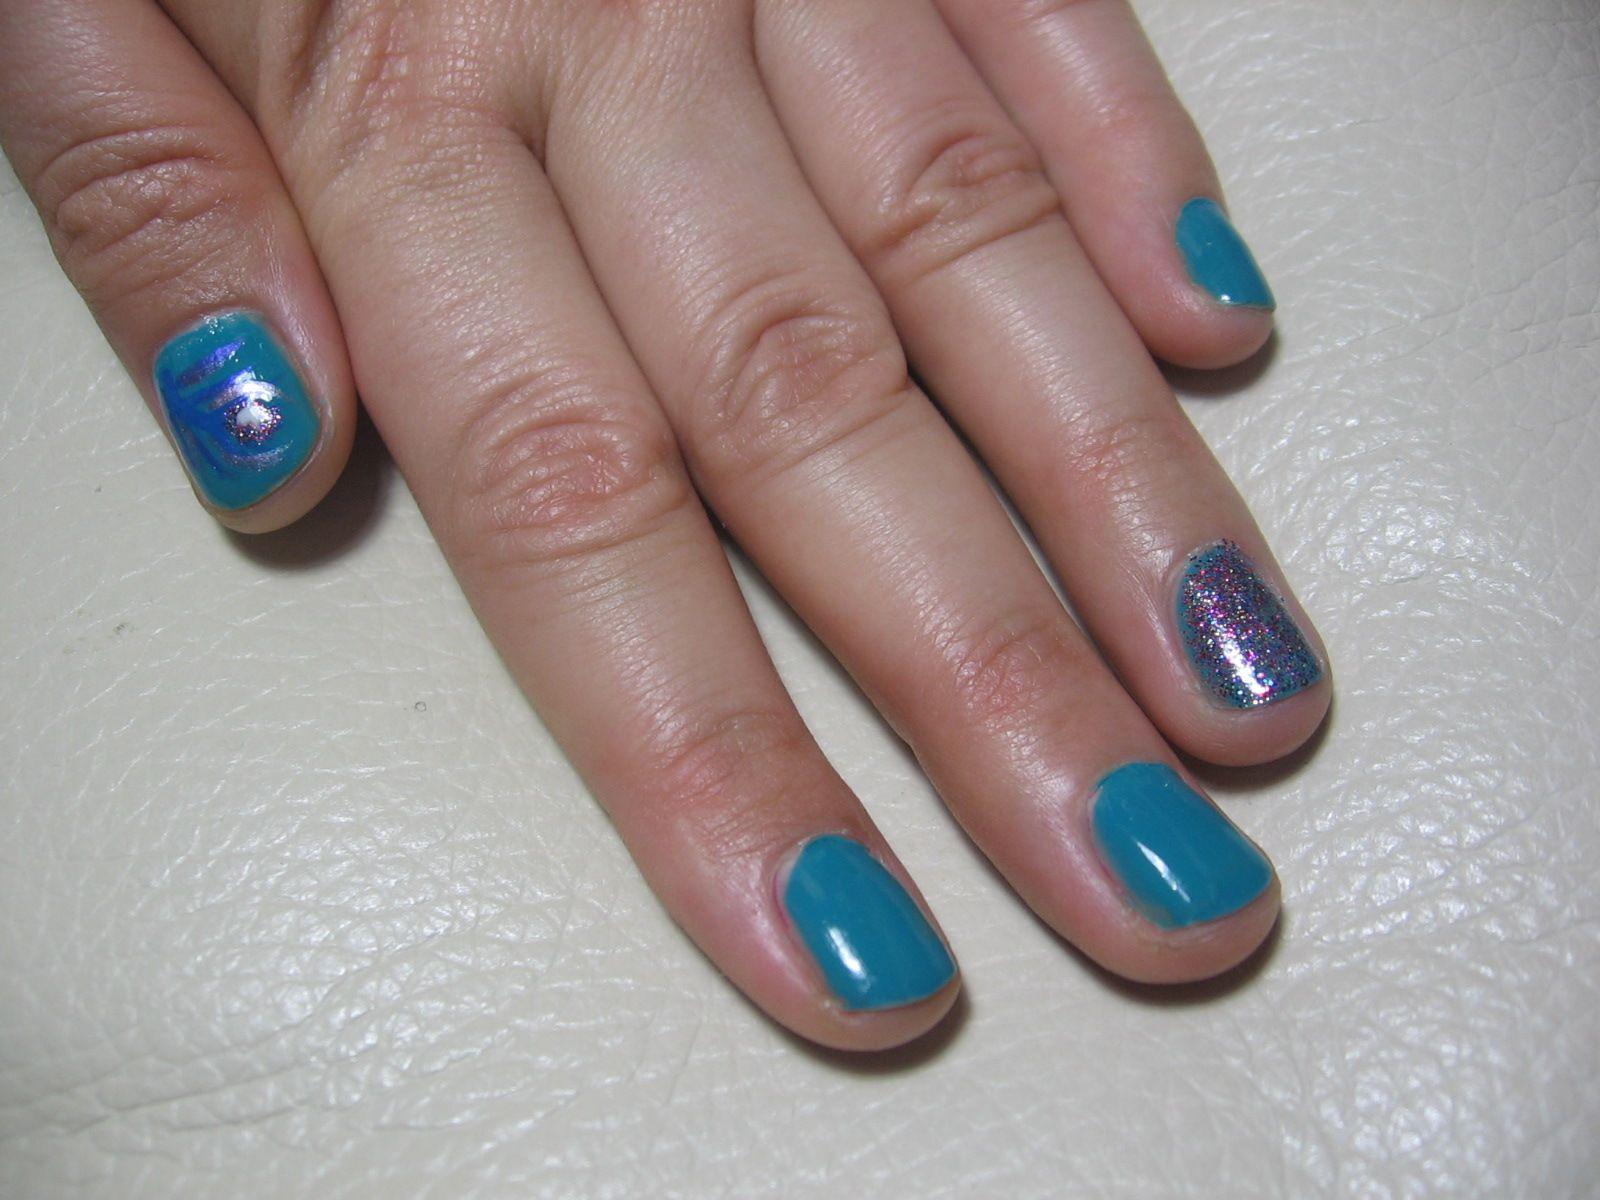 Glitter Peacock Nail Art Opi Fly Sally Hansen Rockstar Pink Nail